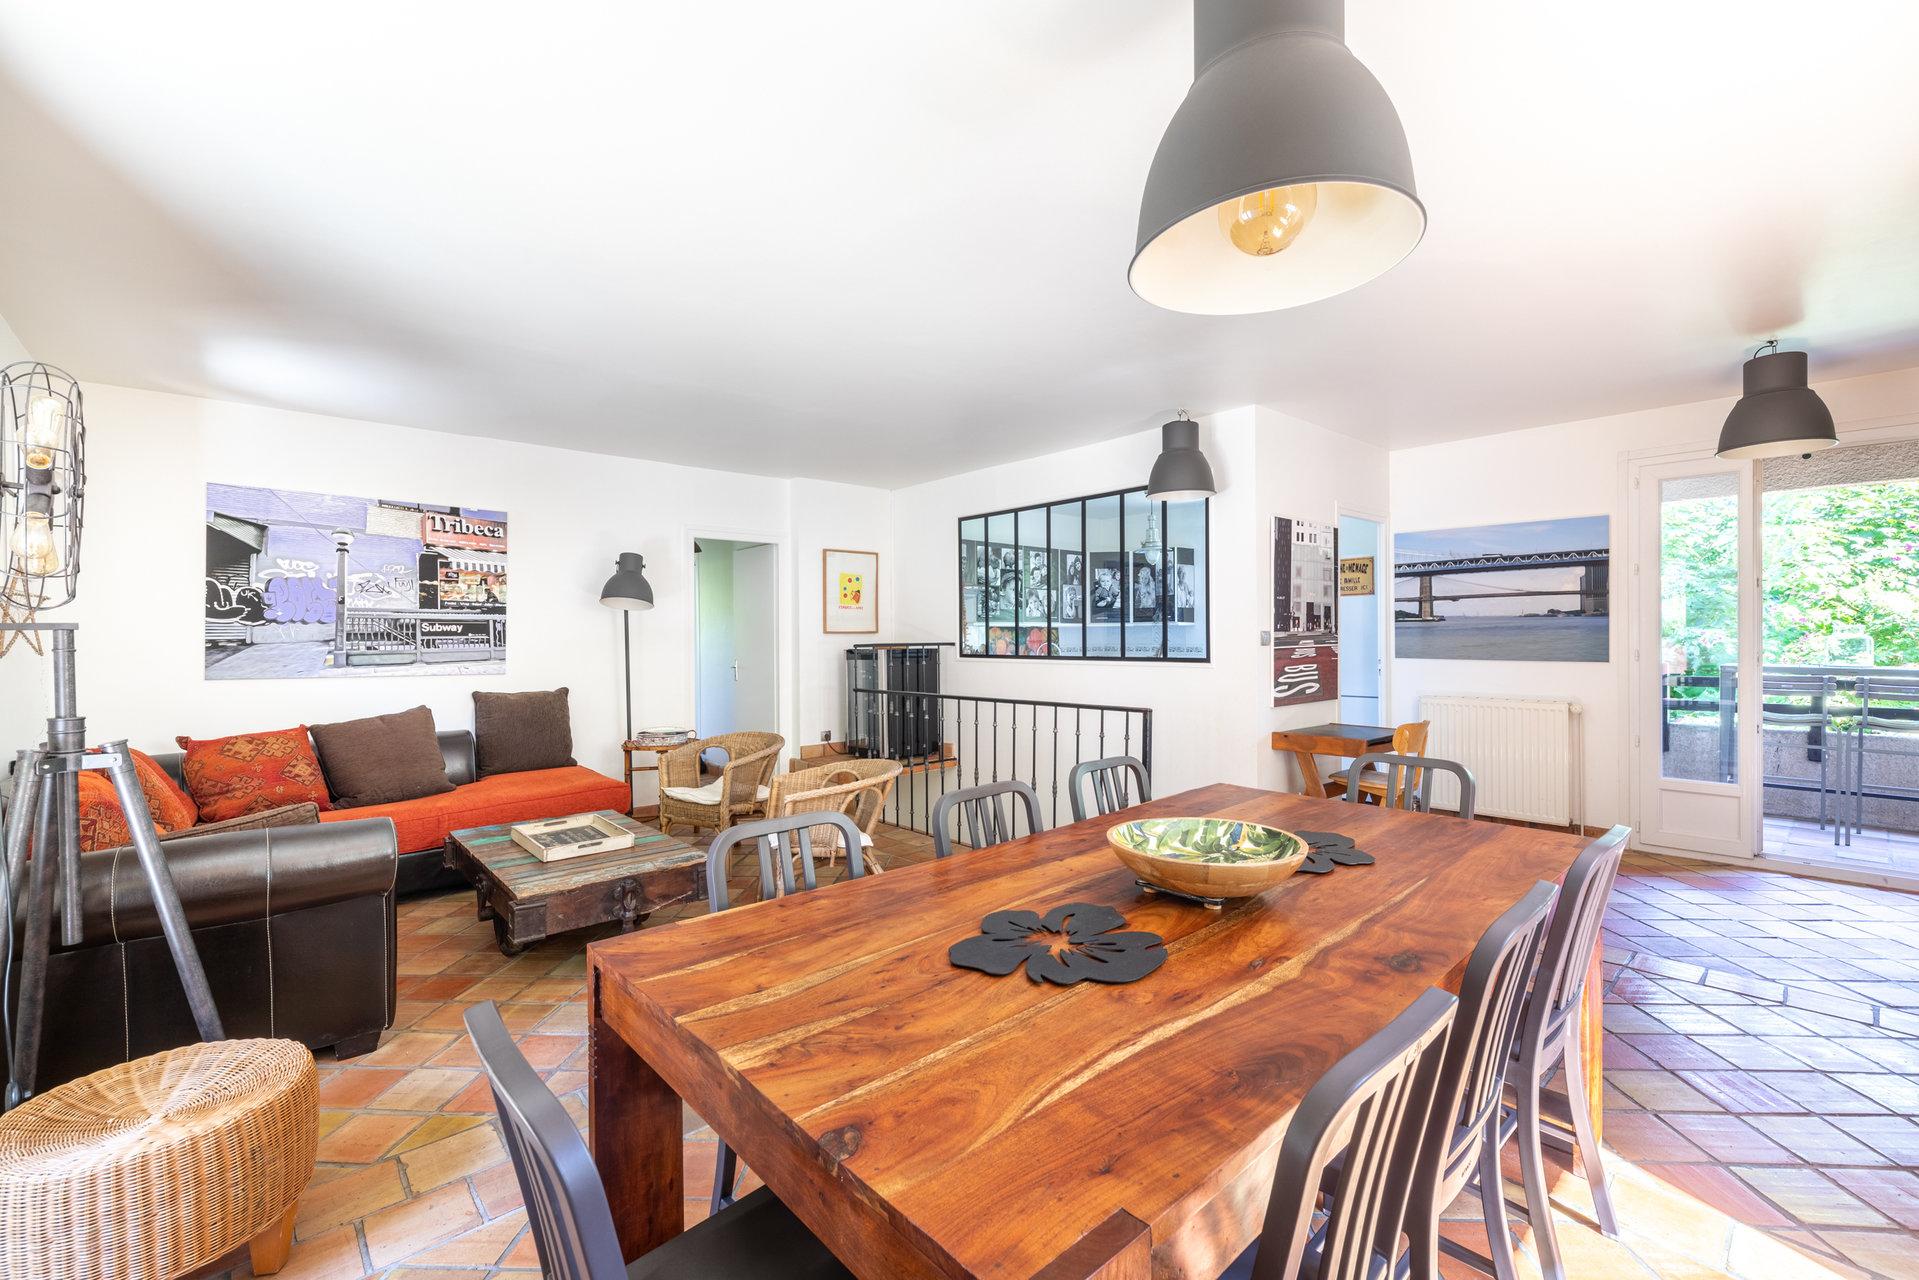 RARE, AU CALME : MAISON DE 180 m² AVEC JARDIN